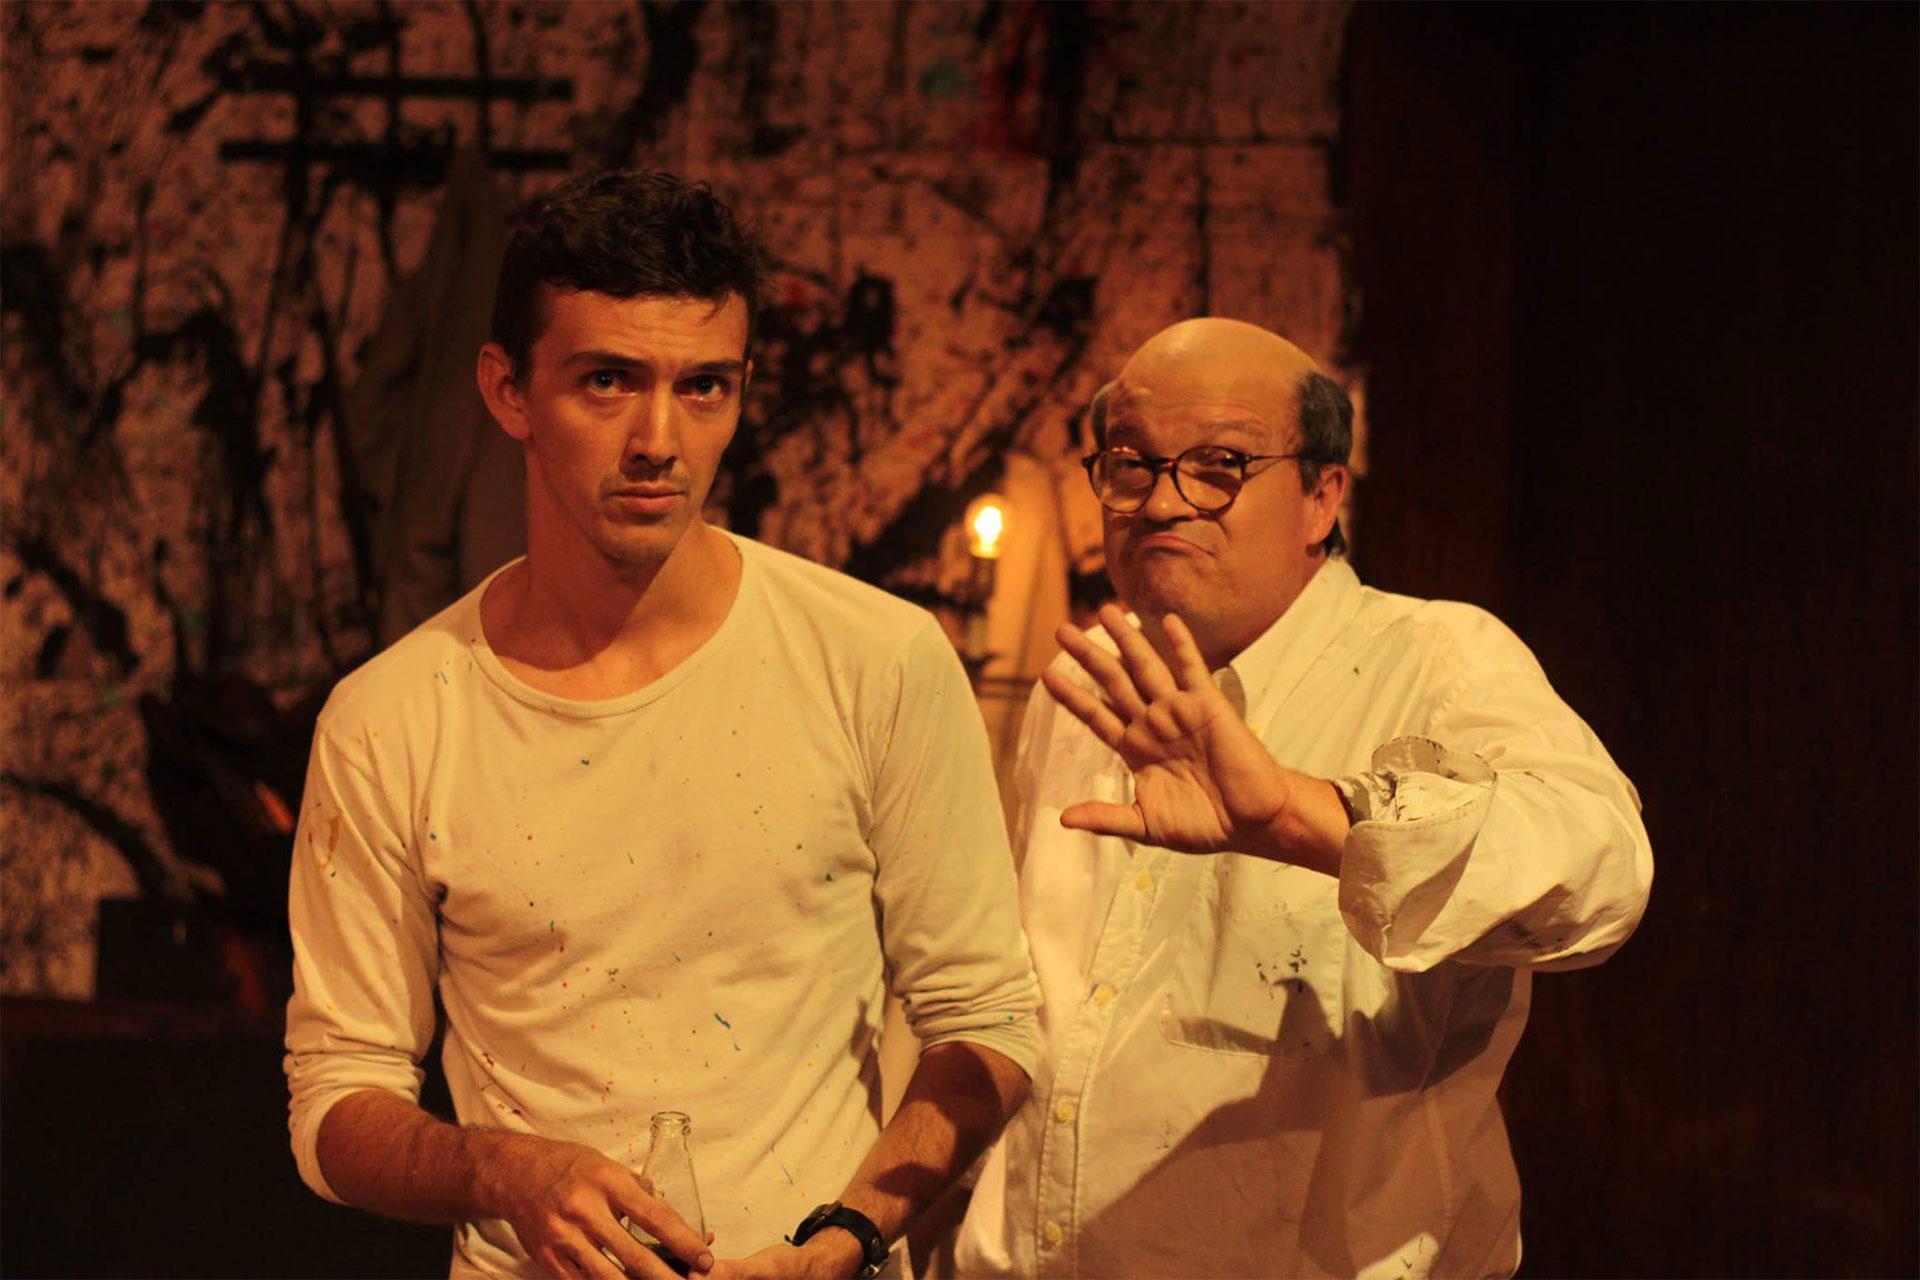 Gabriel Agüero y Basilio Álvarez en el montaje de Rojo. Foto: Daniel Dannery.